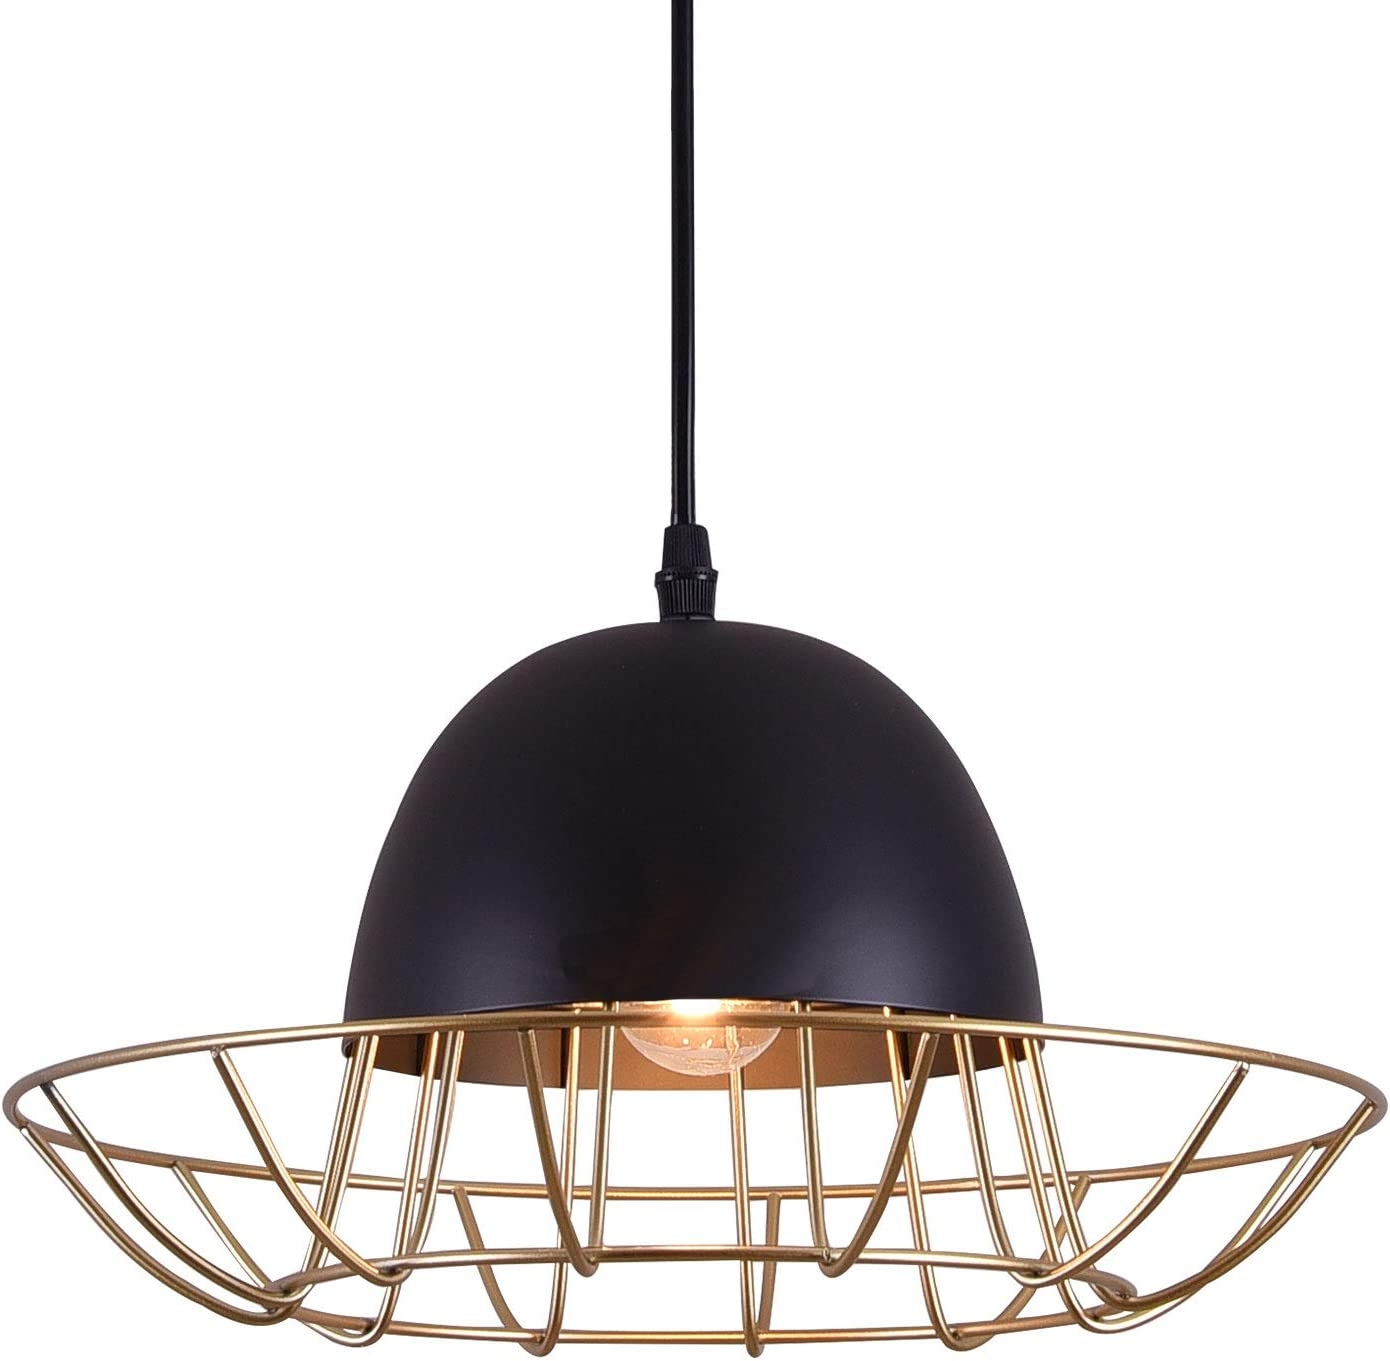 Pendant Lighting, Briever 1 Light Hanging Pendant Lamp,Hat Shape Metal Ceiling Light,Perfect Light for Dining Room, Kitchen, Living Room, Bedroom, Restaurant, Bar